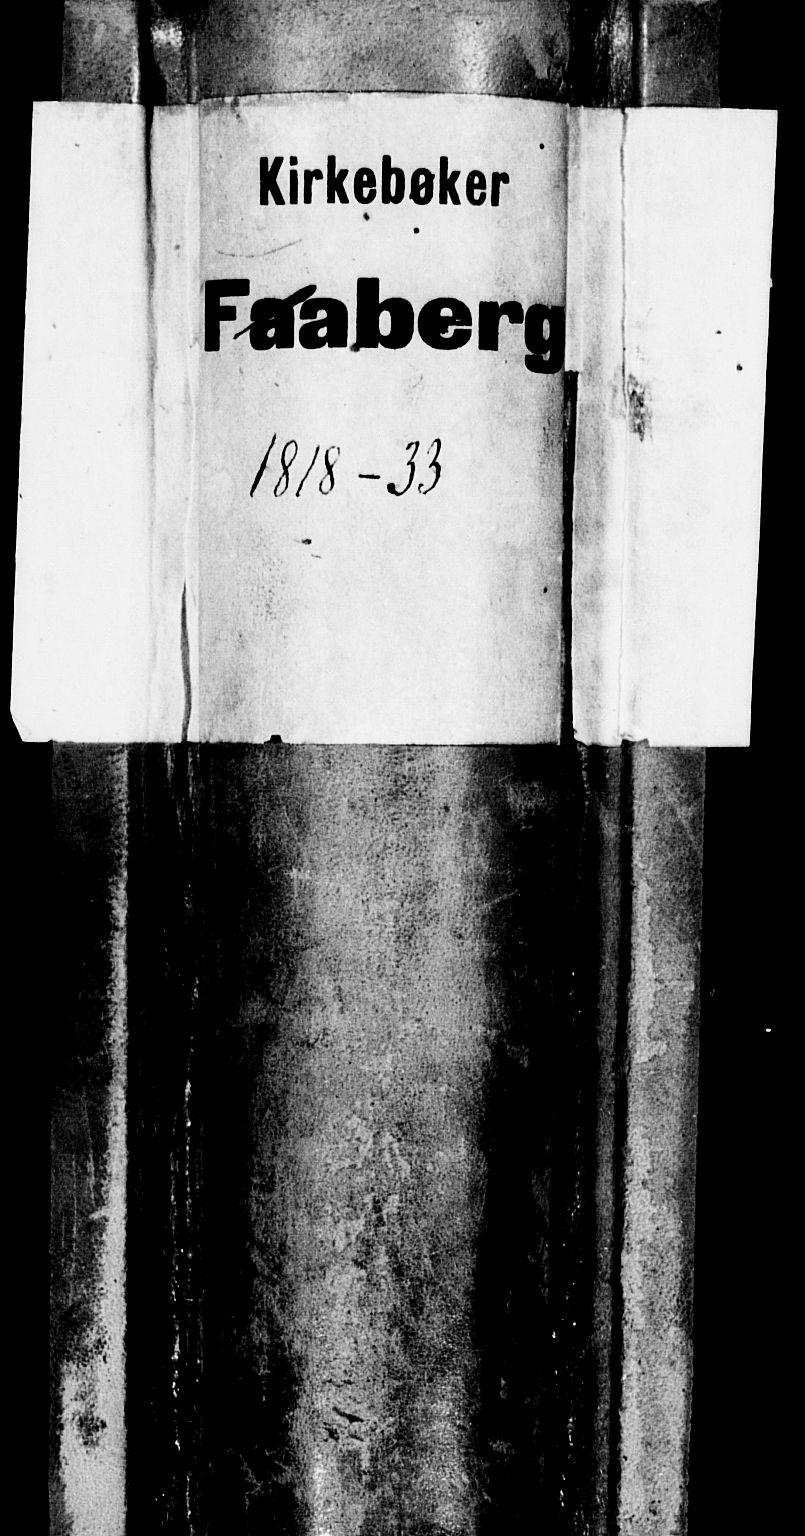 SAH, Fåberg prestekontor, Ministerialbok nr. 3, 1818-1833